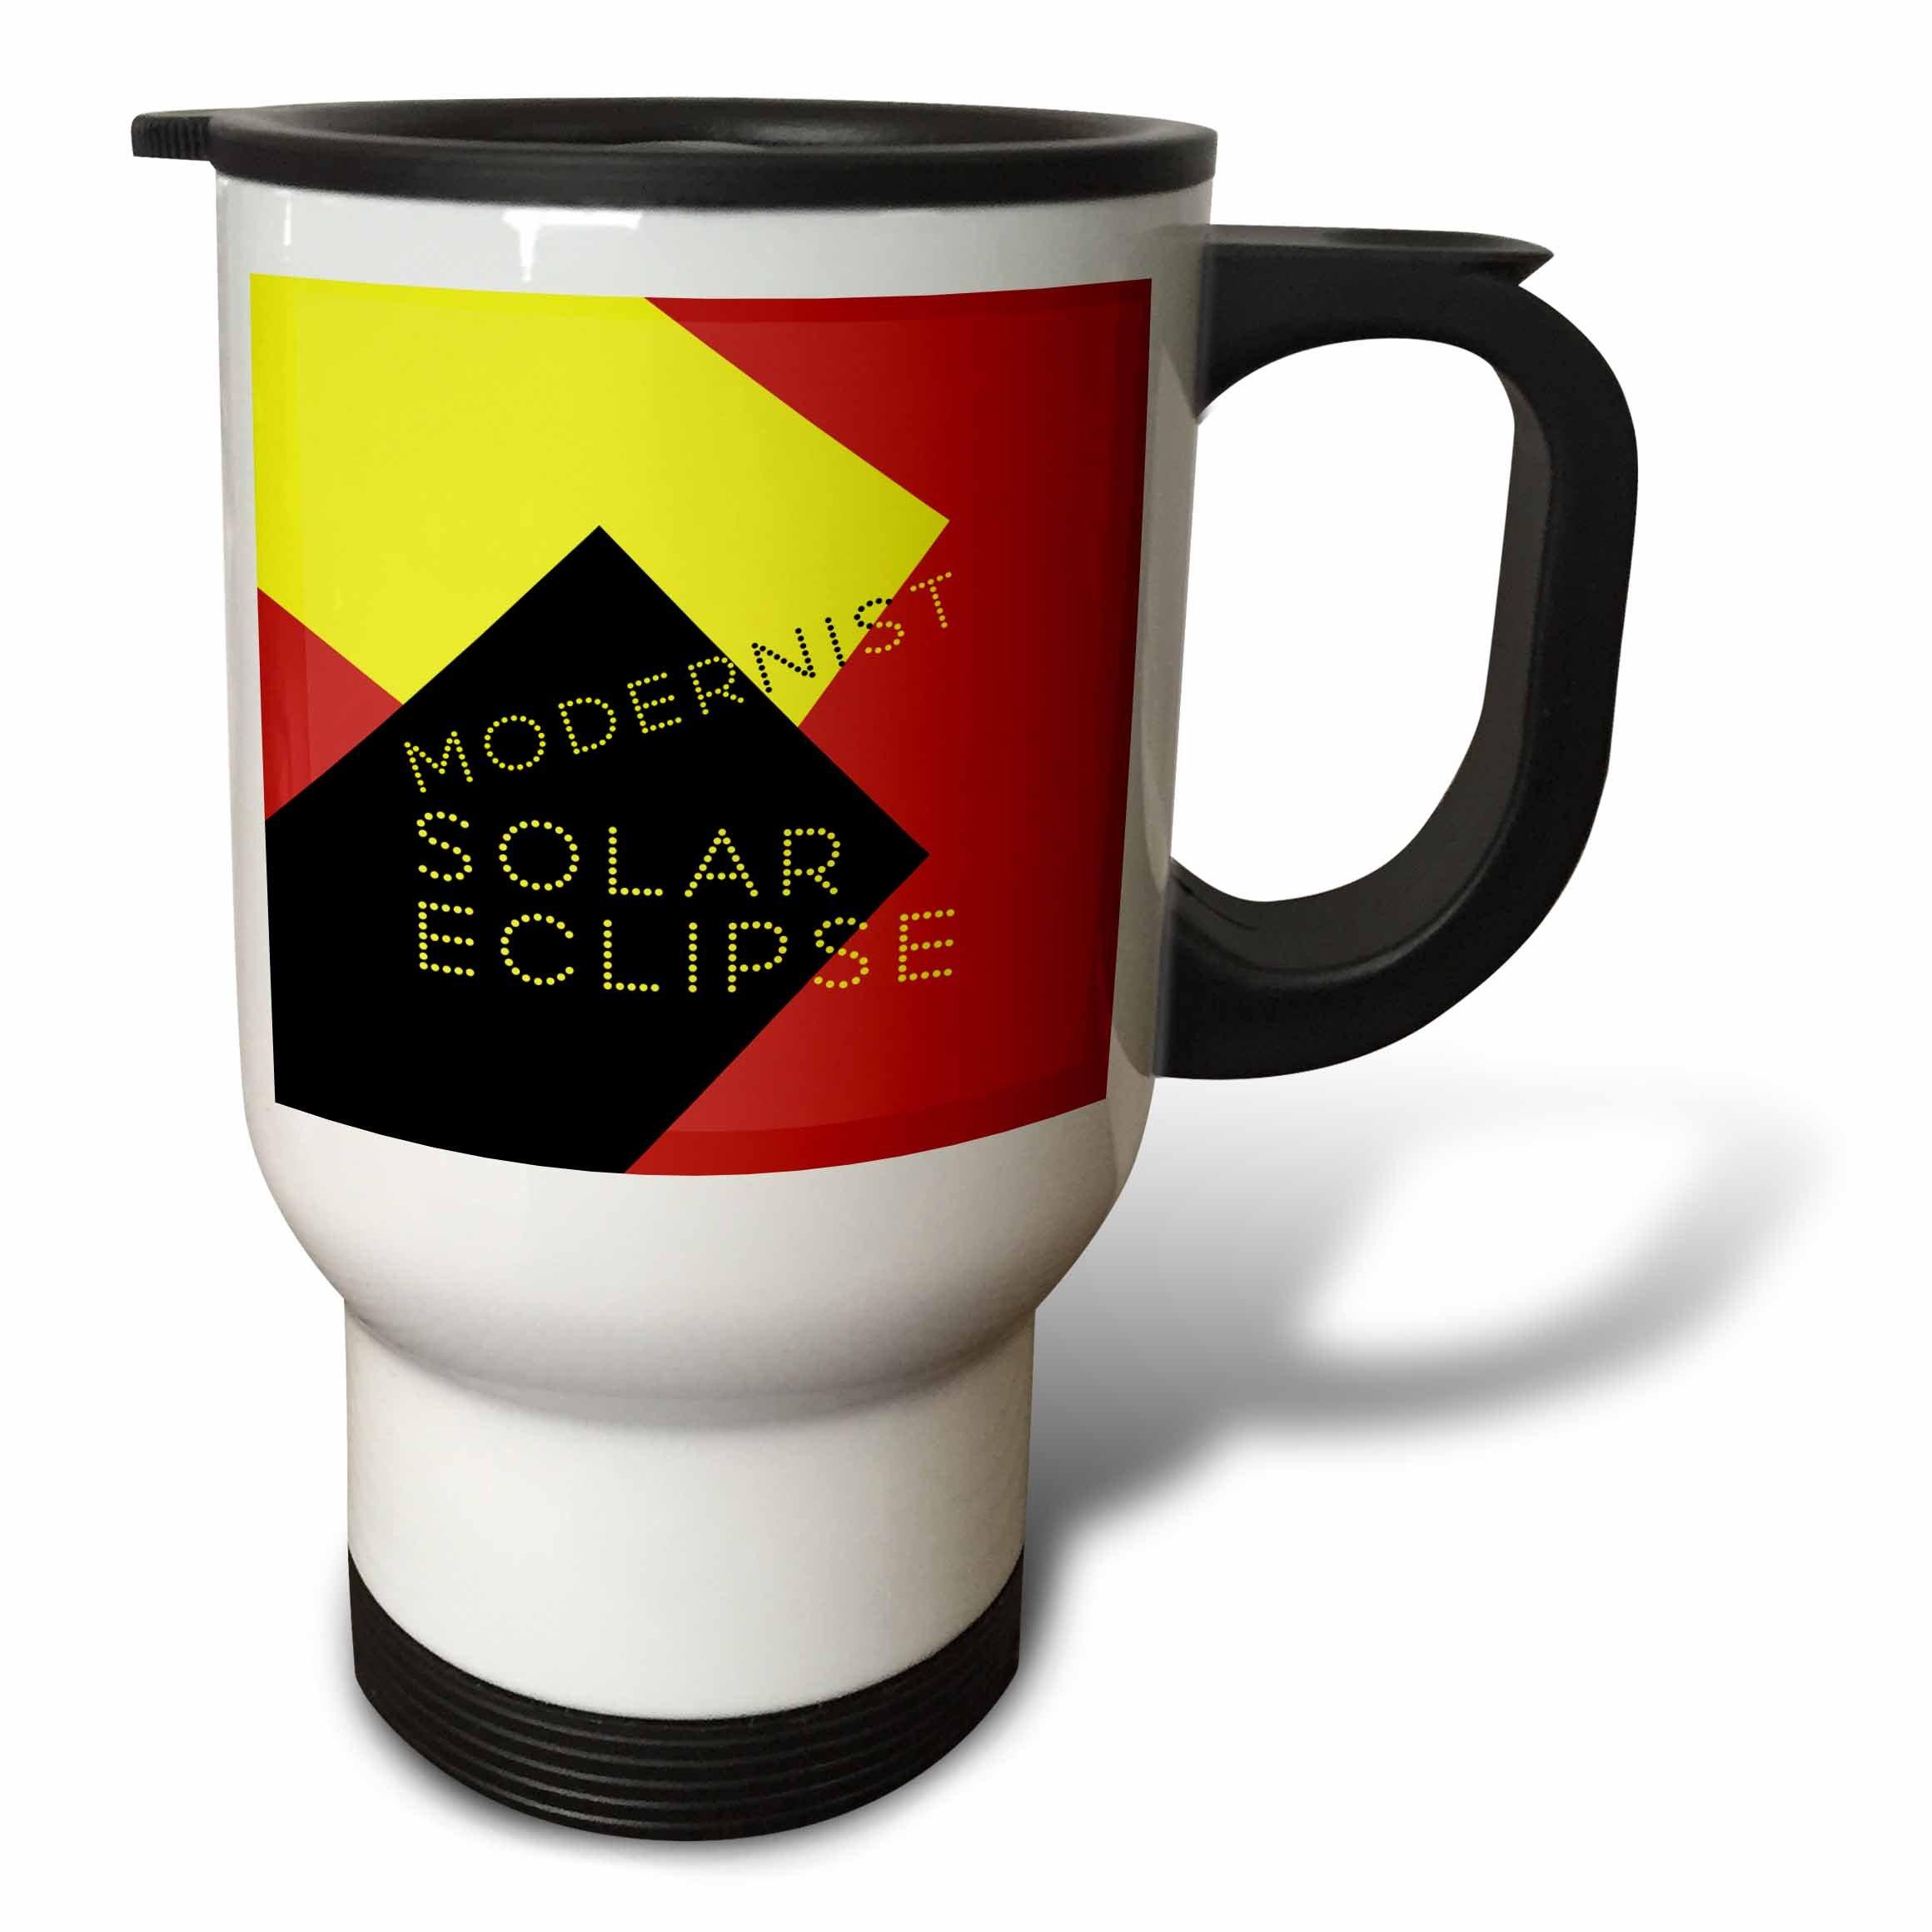 3dRose Alexis Design - Art - Modernist Solar Eclipse Art - 14oz Stainless Steel Travel Mug (tm_271749_1)